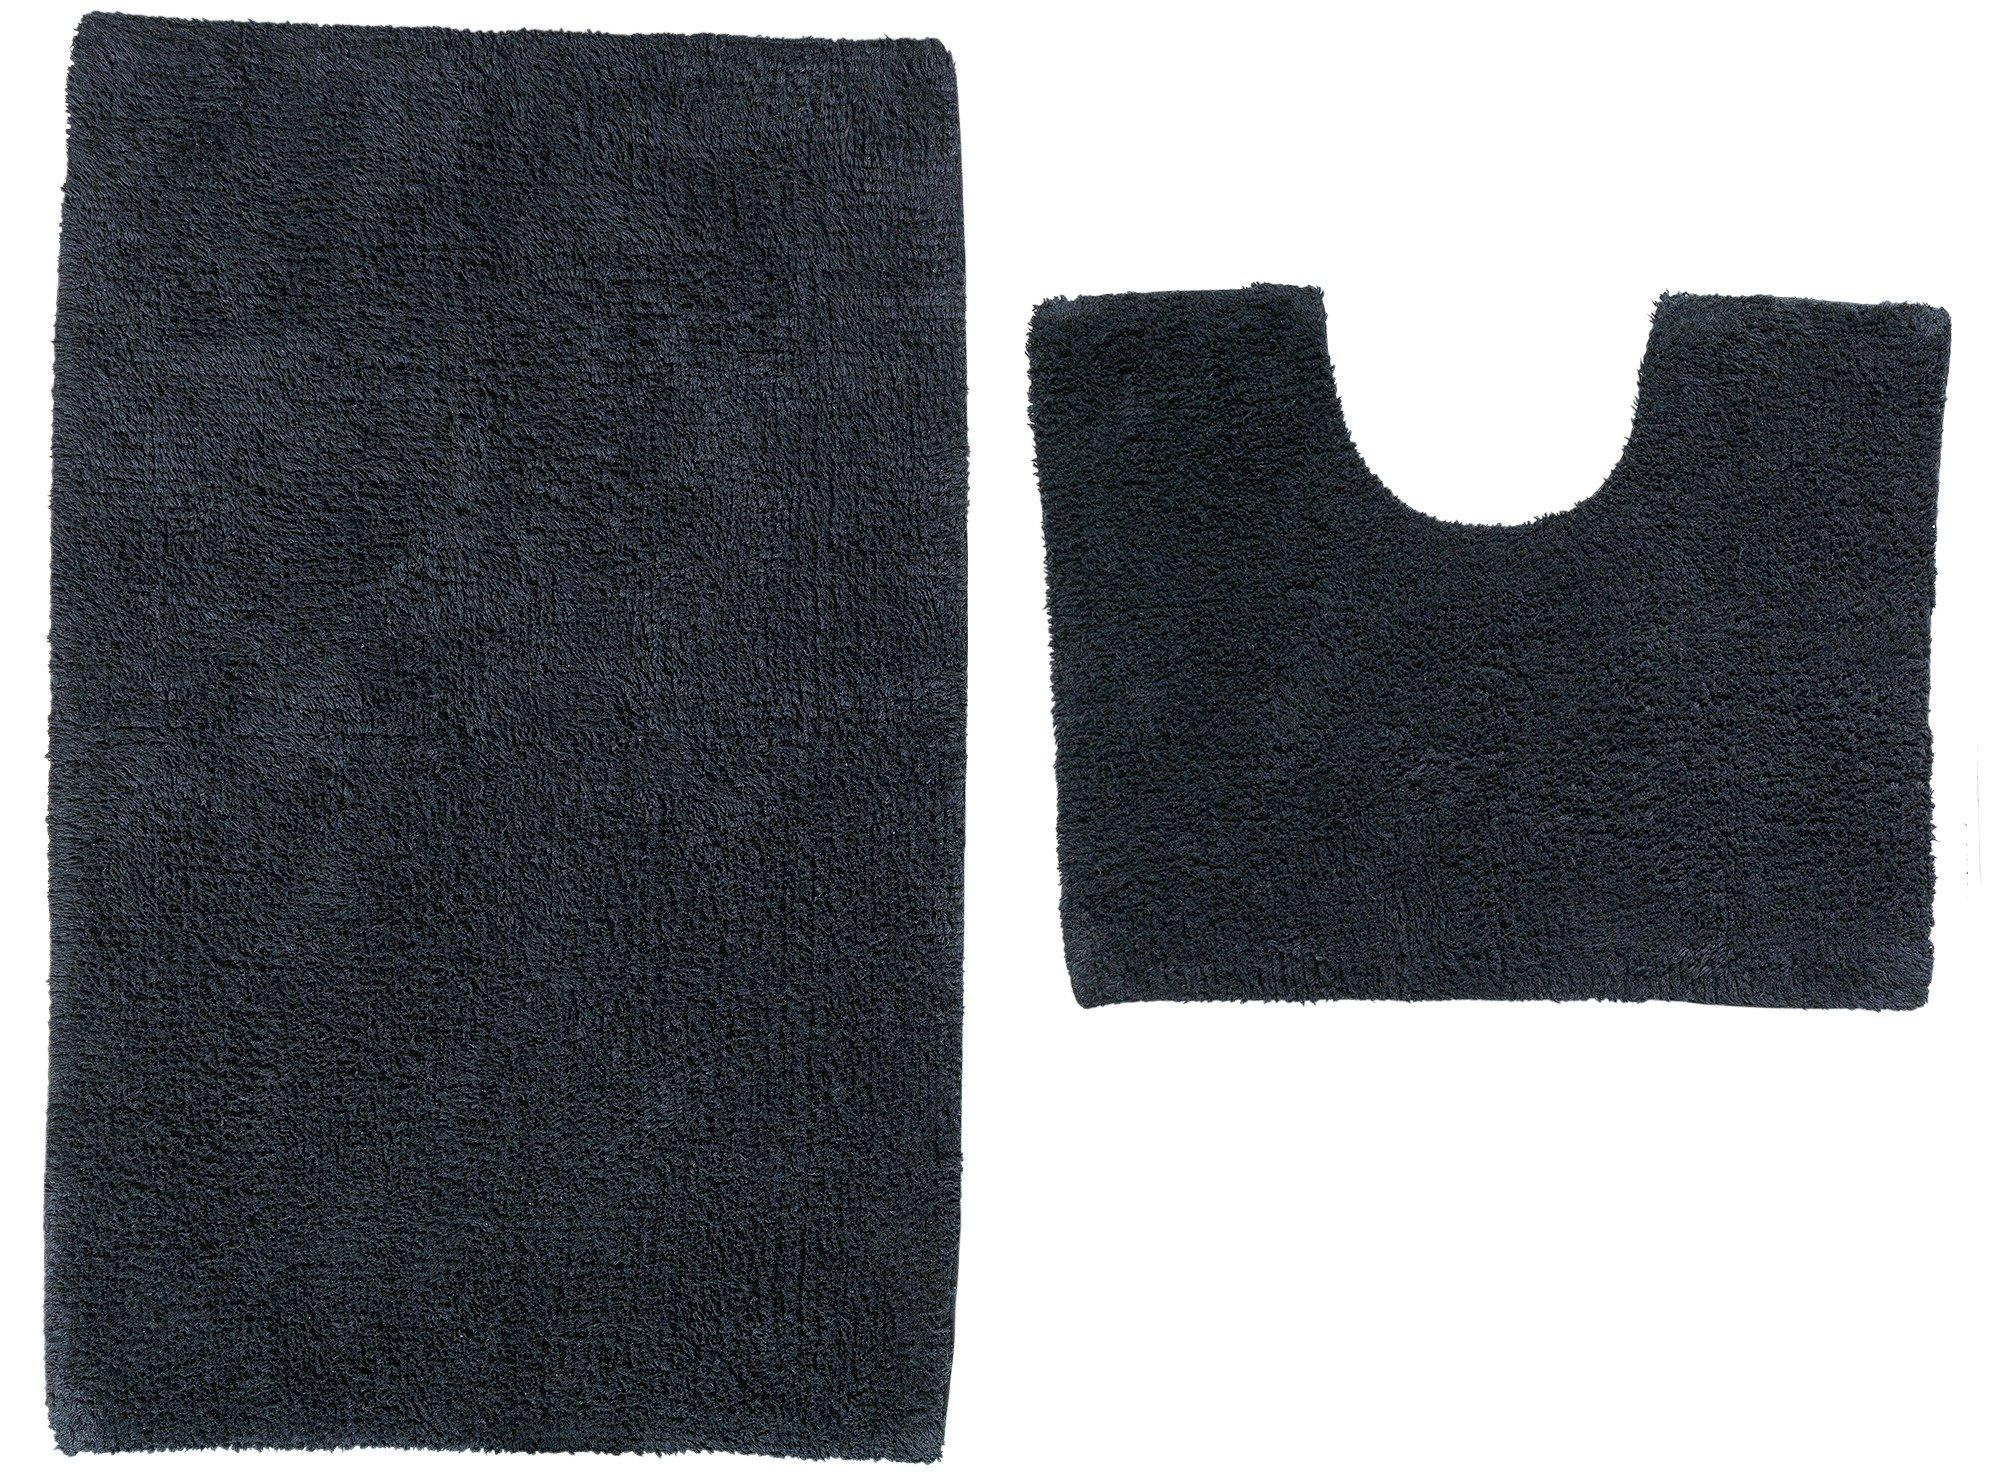 Argos Home Bath and Pedestal Mat Set - Black